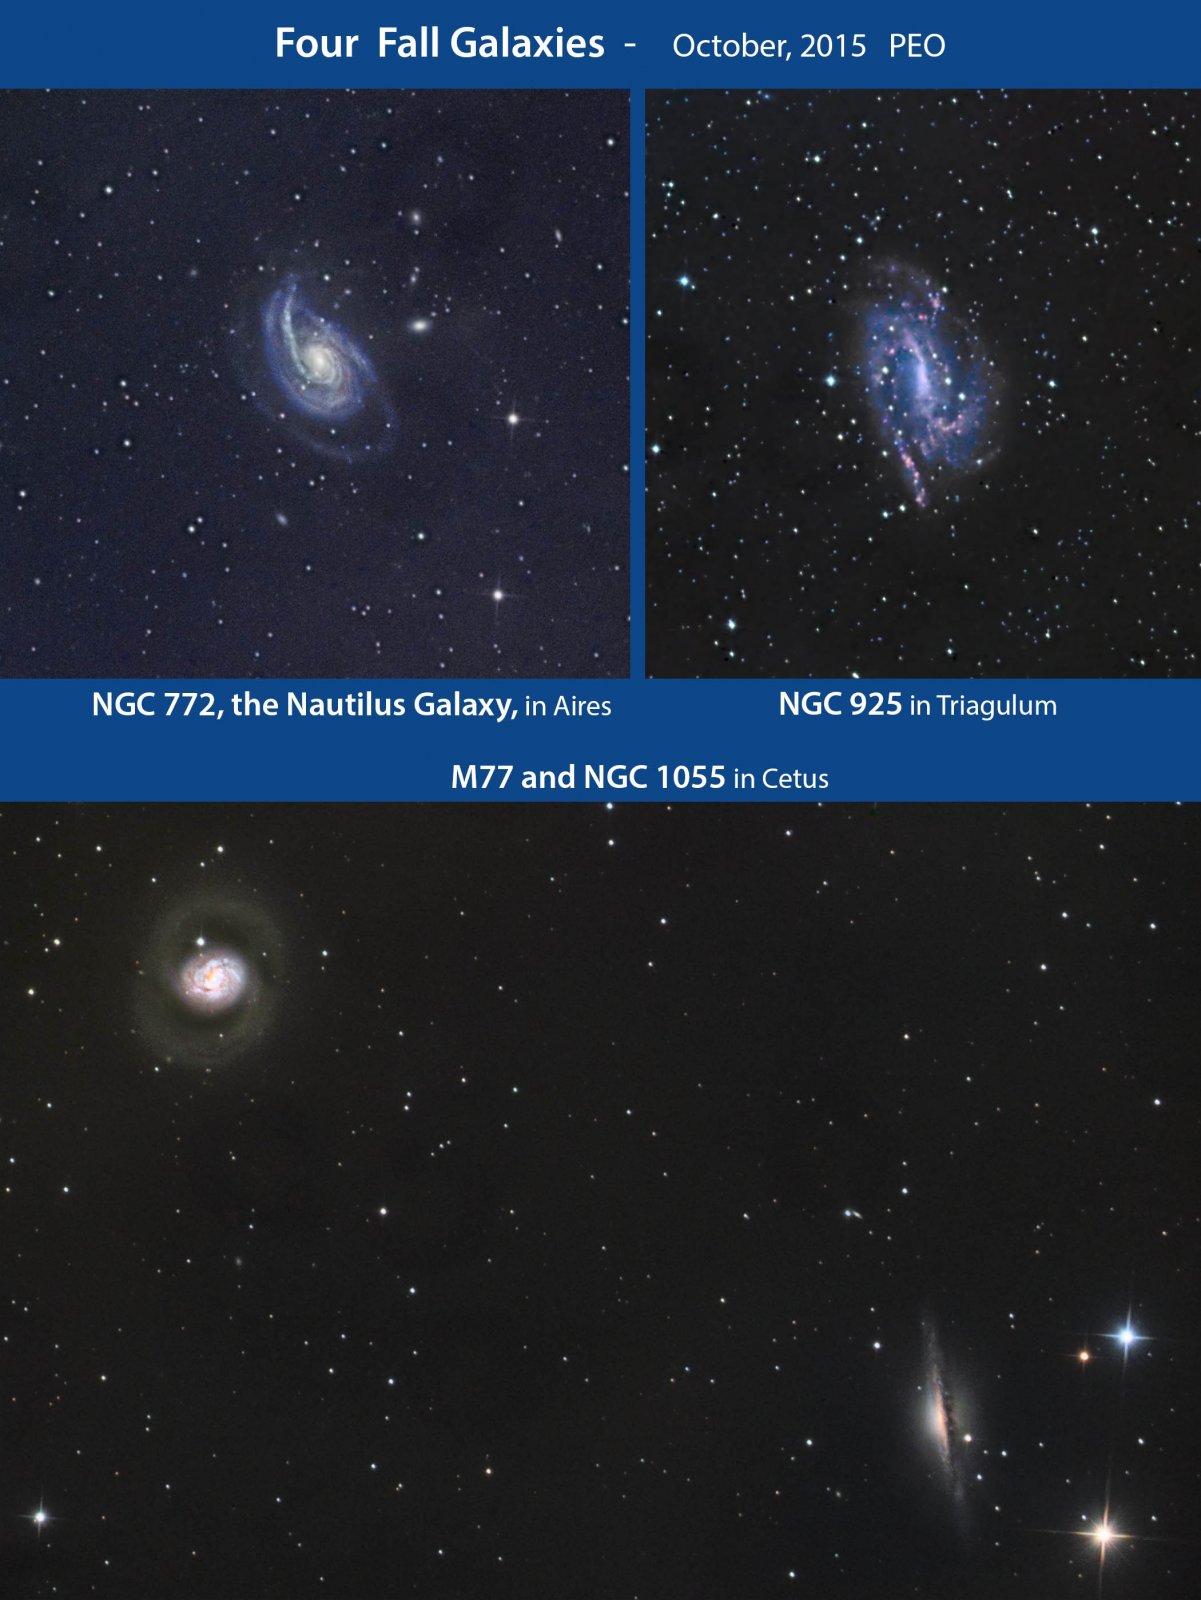 Fall Galaxies